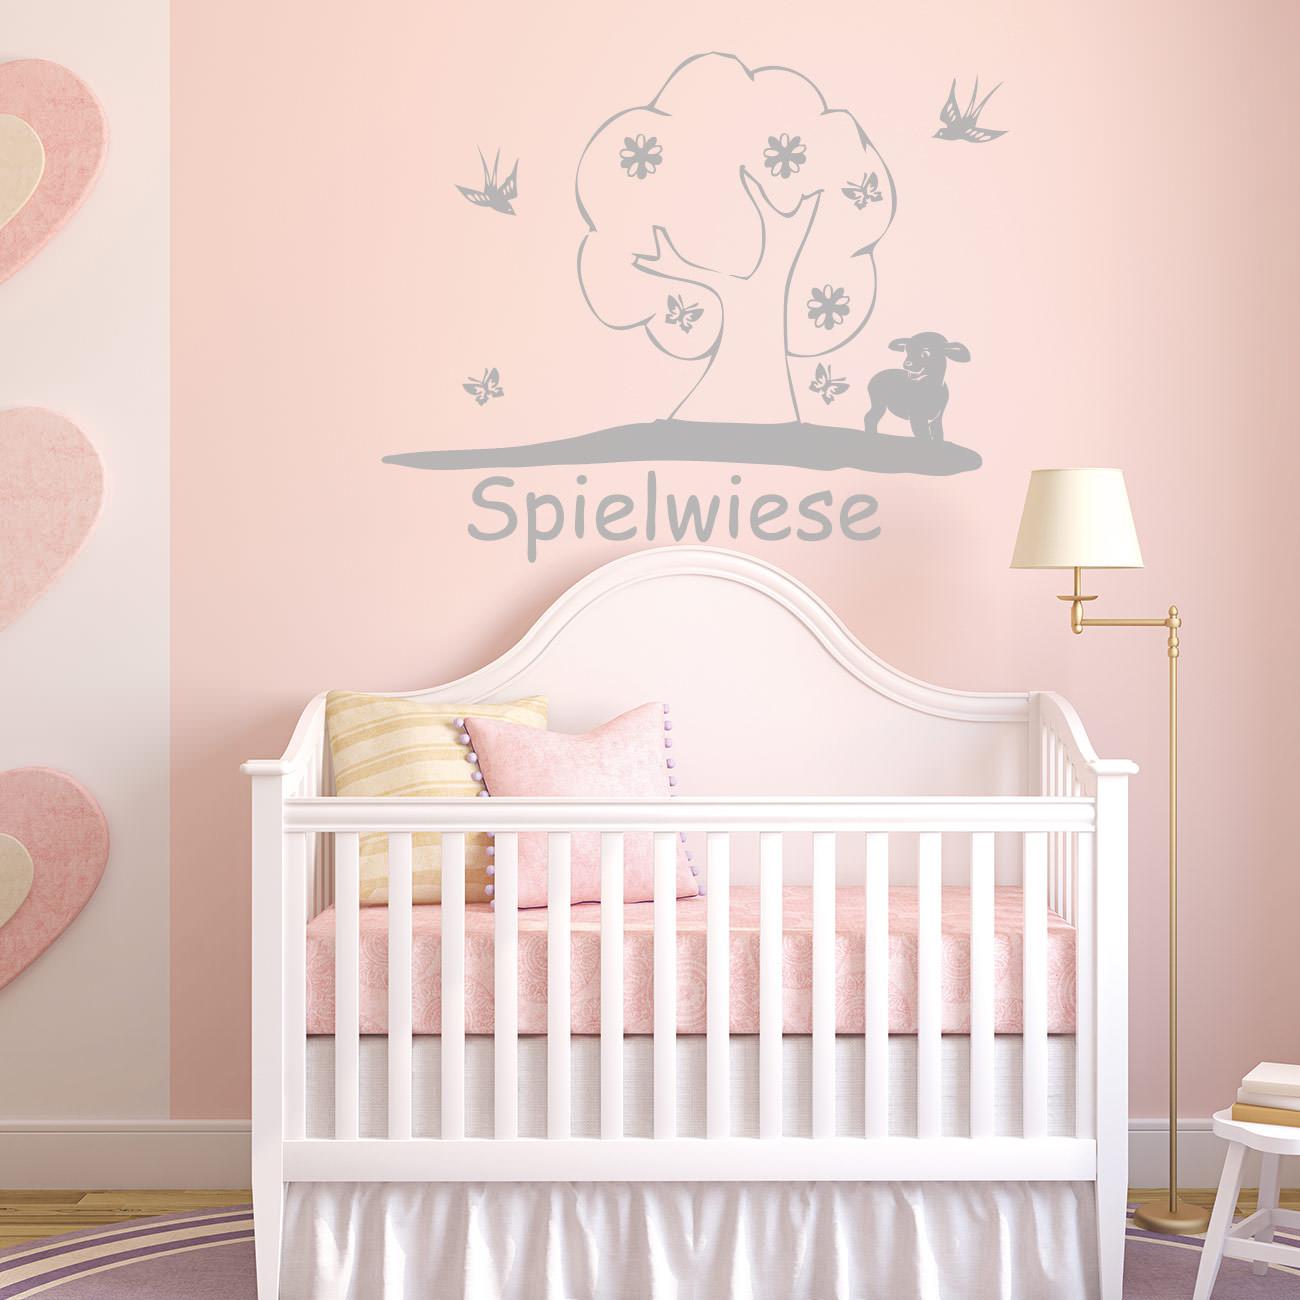 spielwiese f r ihr kinderzimmer sunnywall sunnywall online shop. Black Bedroom Furniture Sets. Home Design Ideas